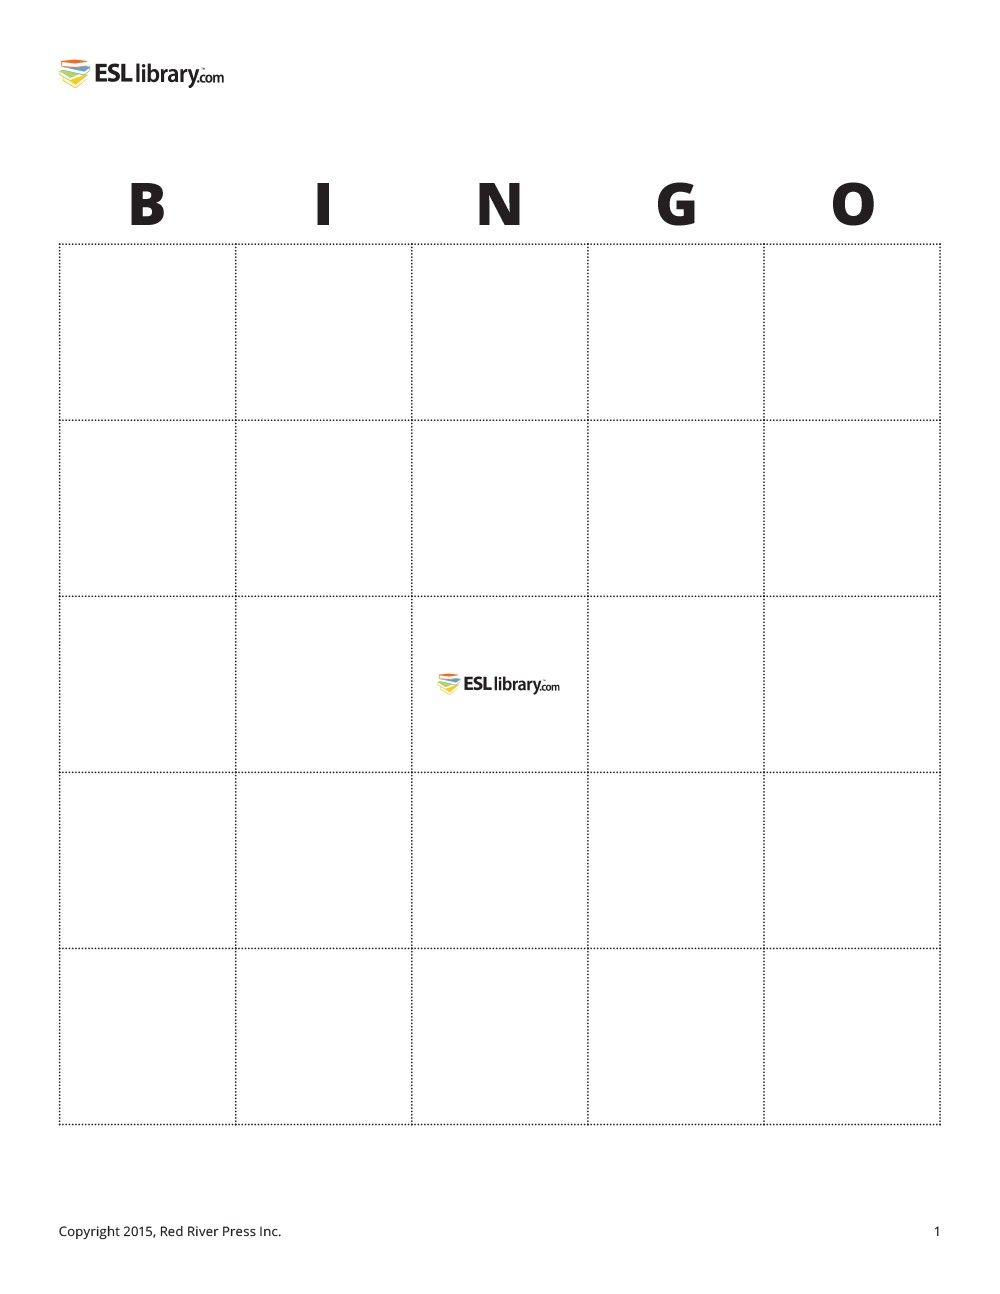 Pin By Silvia On Teaching Irregular Verbs Fun Activities English Verbs [ 1294 x 1000 Pixel ]